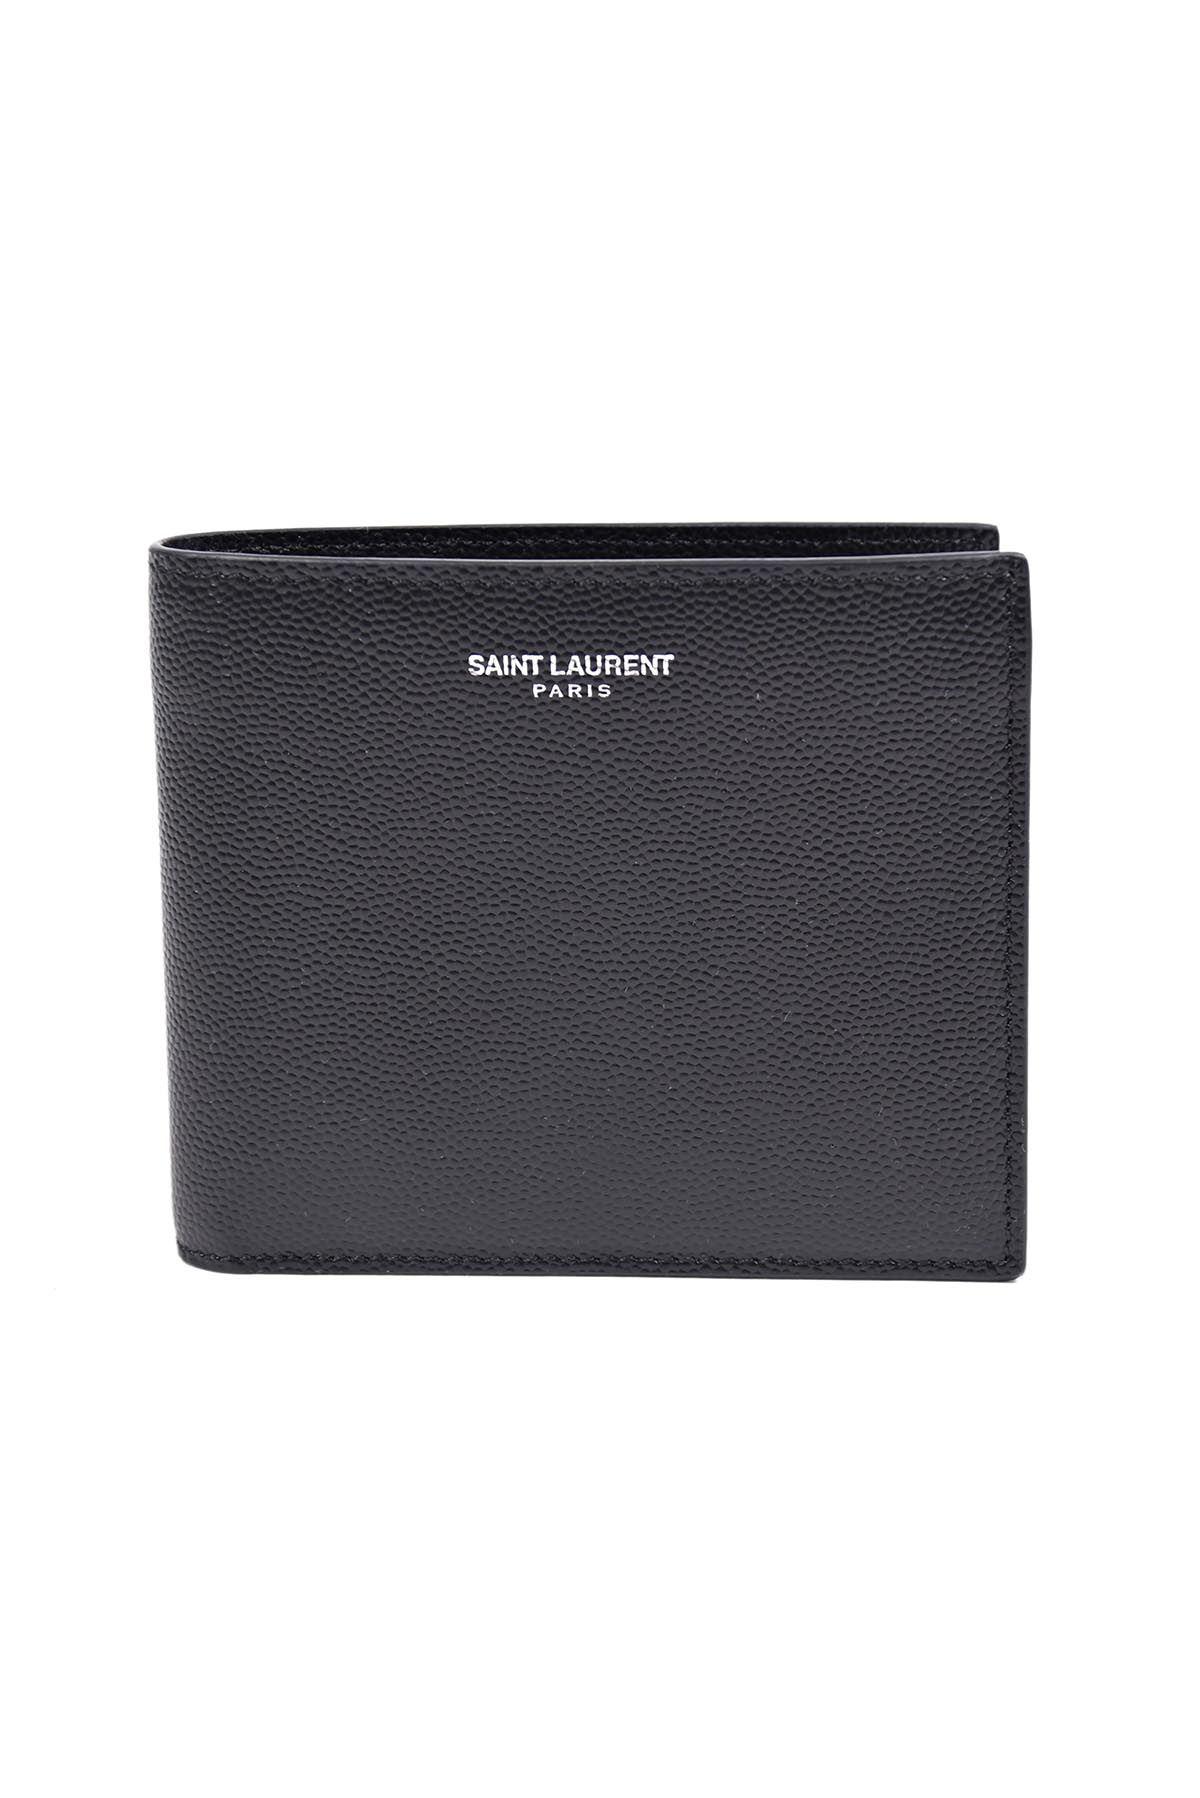 Saint Laurent Monogramme Wallet